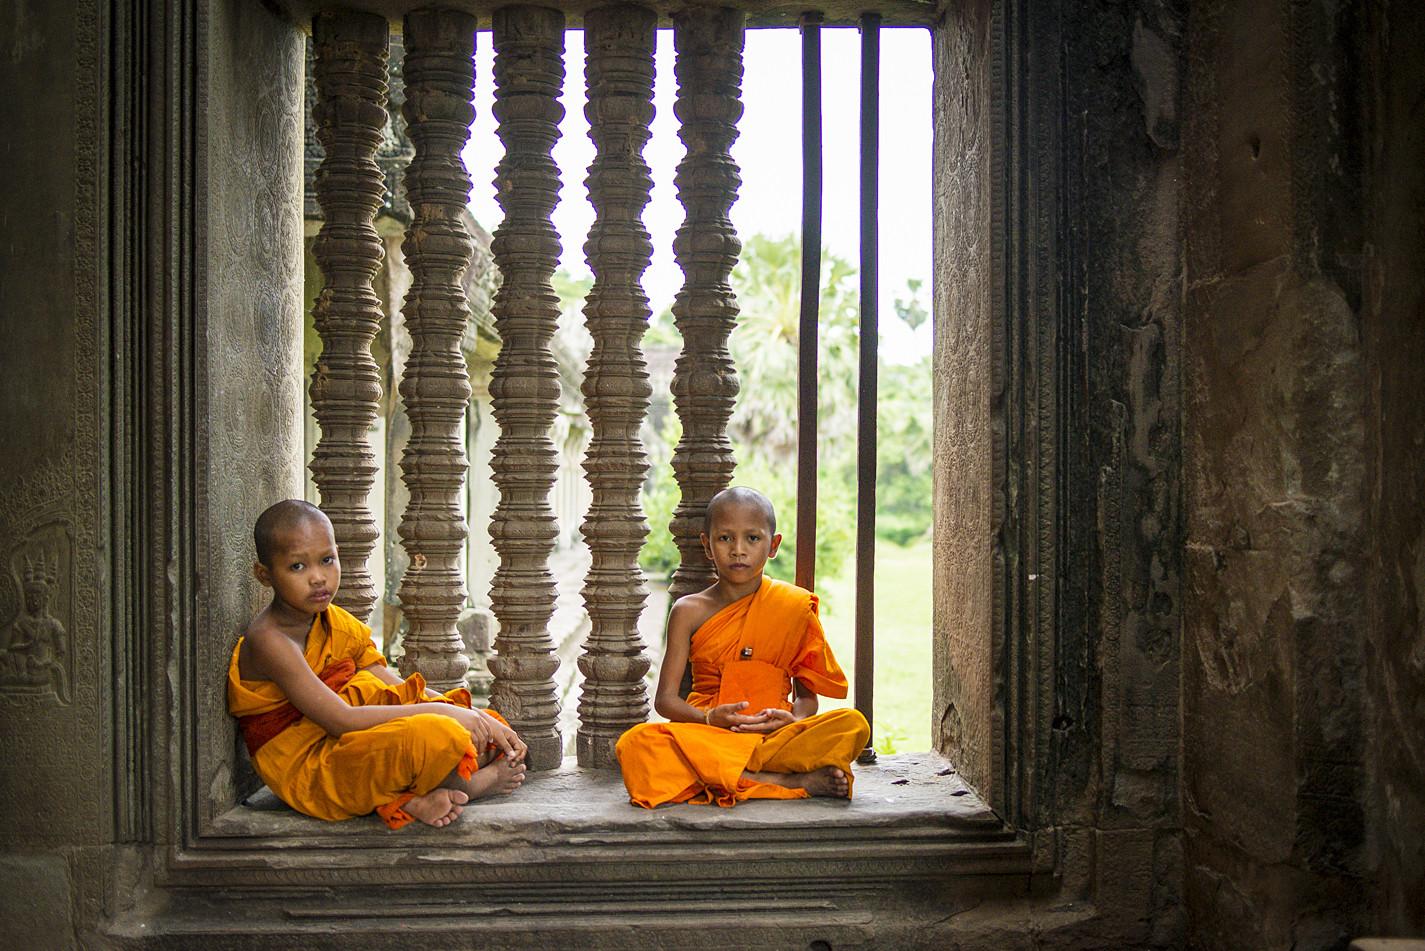 cambodia-photo-tours-angkor-wat-buddhist-monks